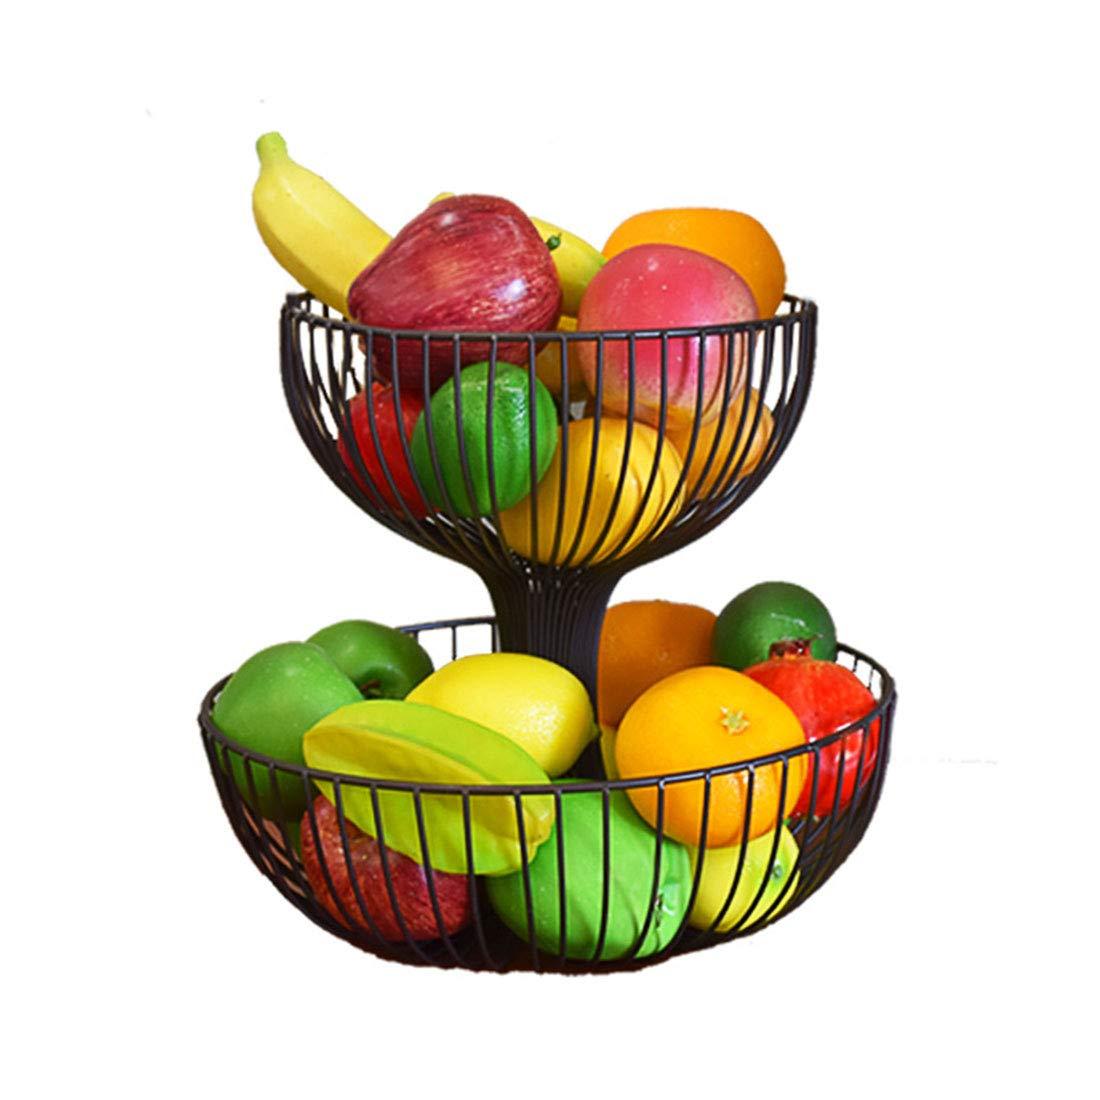 XX_C フルーツバスケット フルーツ収納2段フルーツボウルパンフルーツラック2層メタルフルーツホルダーフルーツプレートフルーツボウル -キッチン用品食器 (色 : ブラス ぶらす, サイズ さいず : B) B ブラス ぶらす B07QRRL3RD